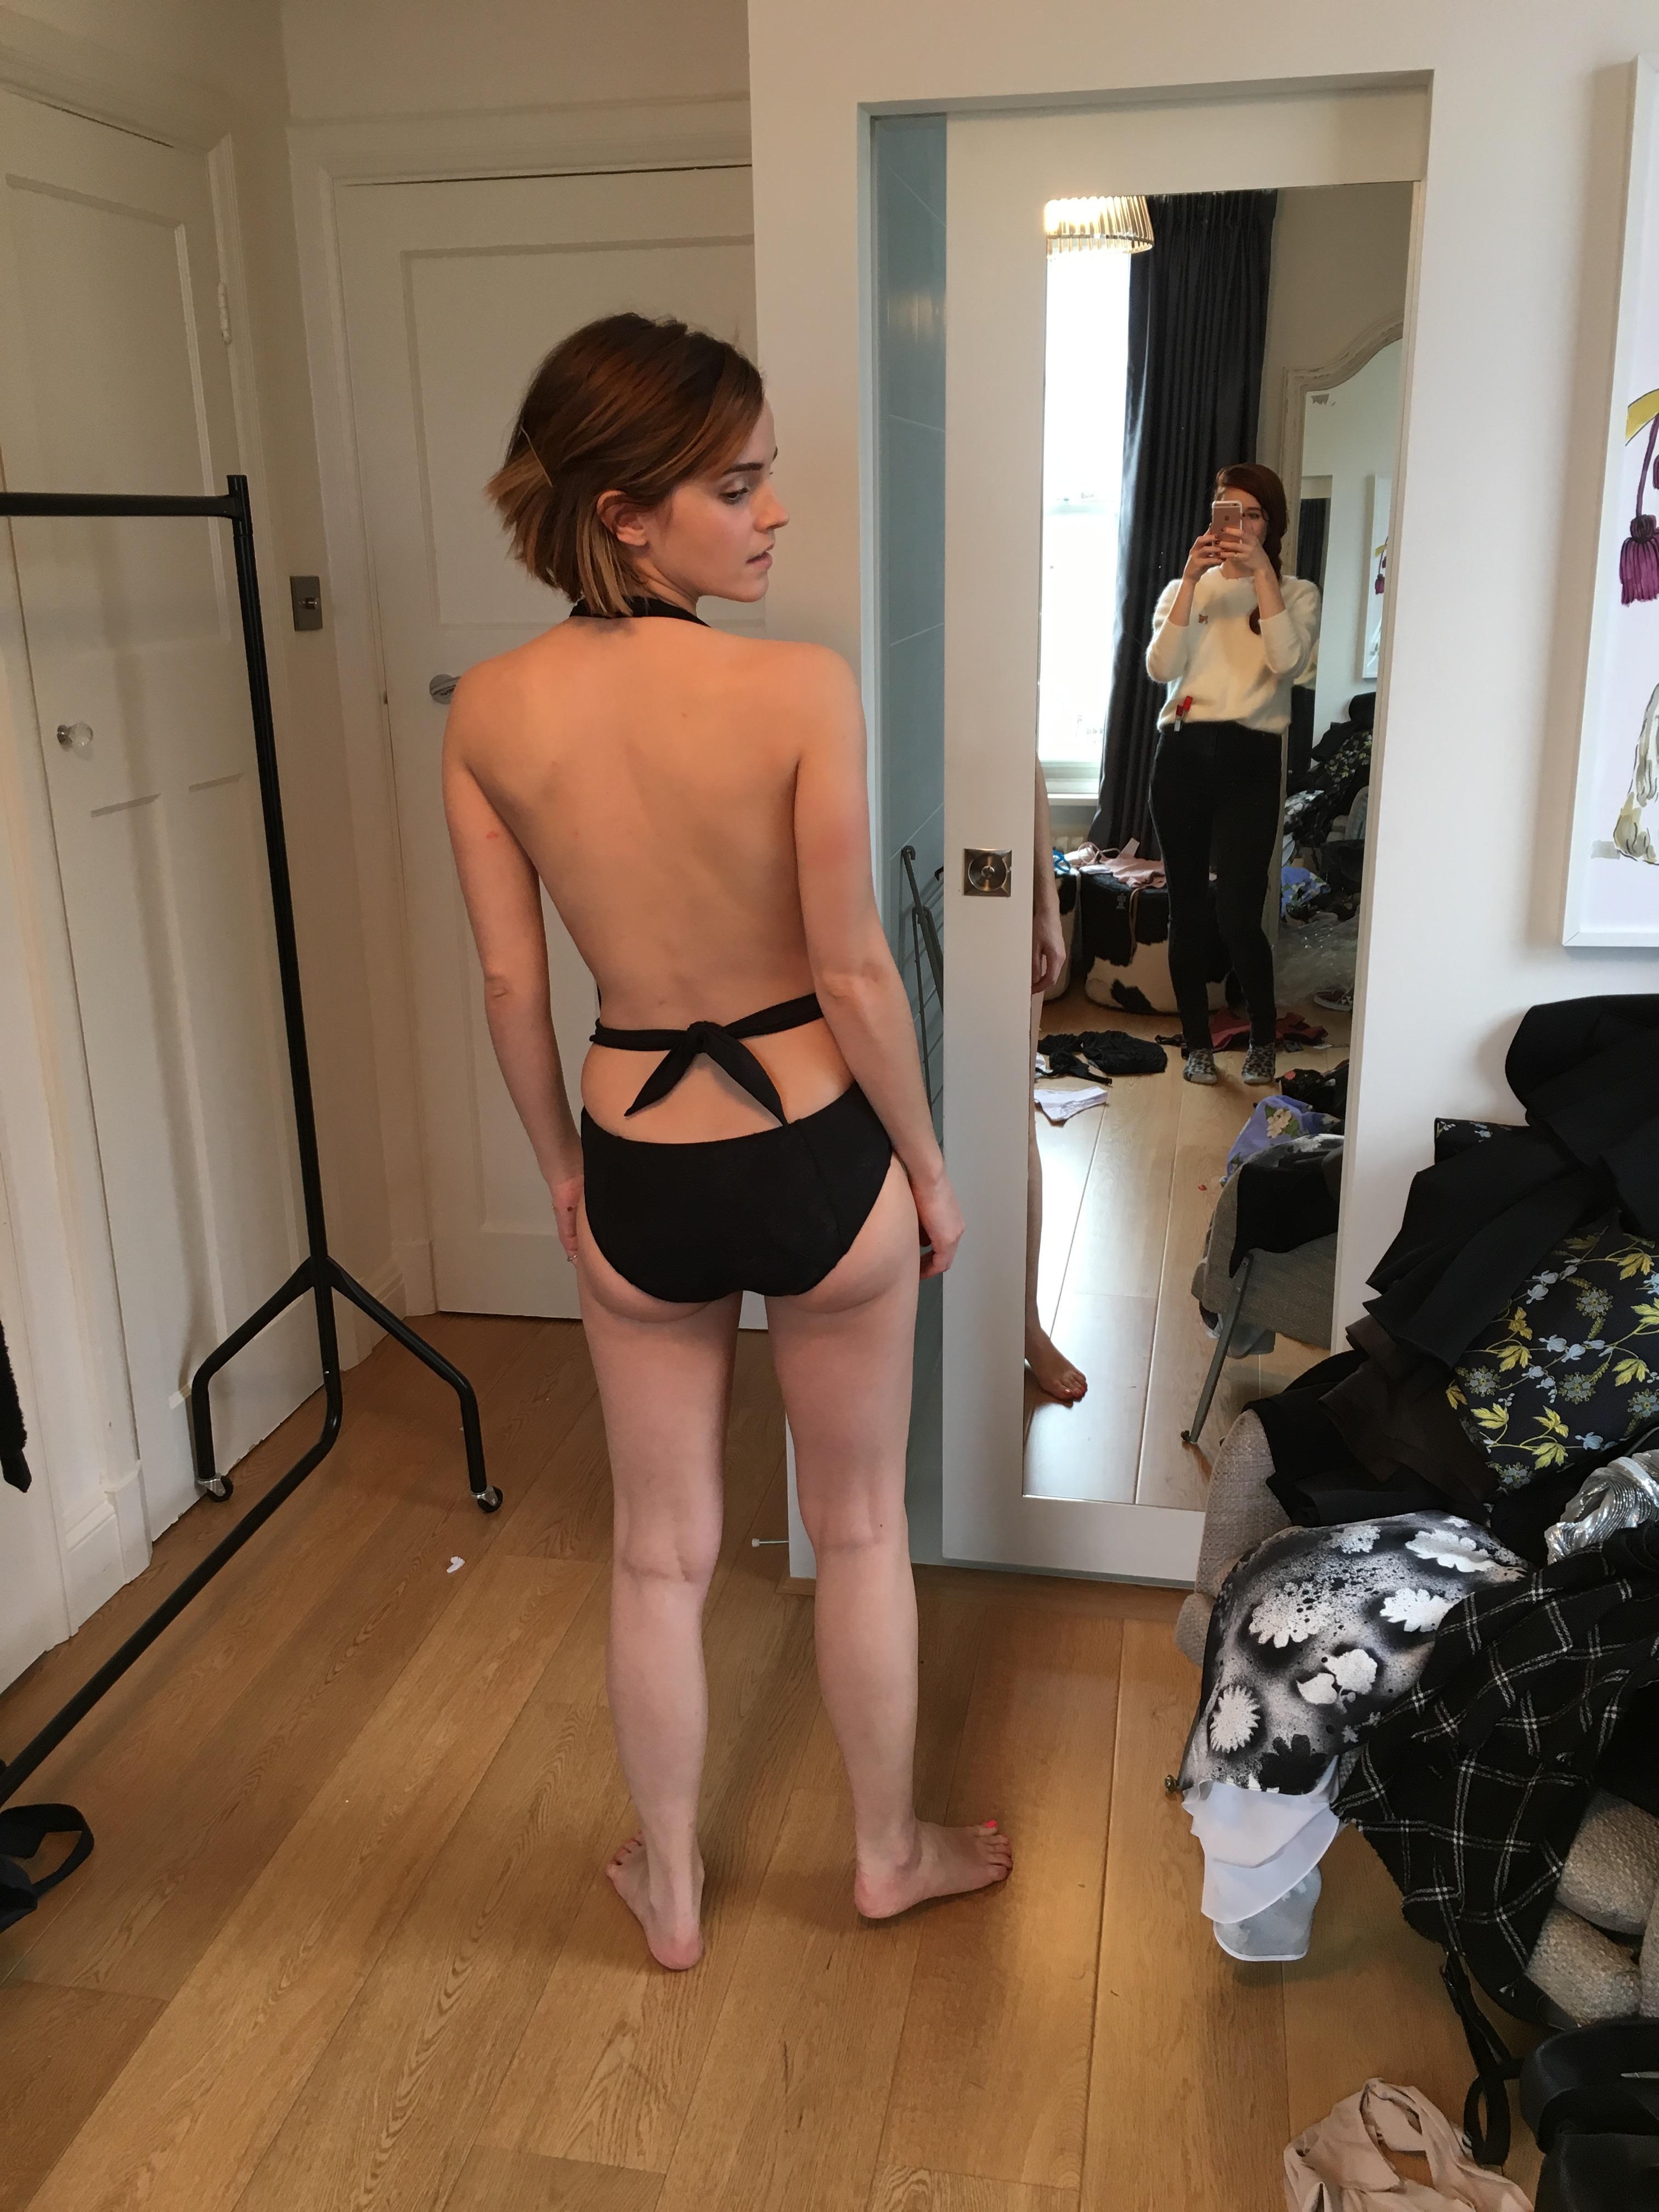 Emma-Watson-topless-pic-A5EJSN.jpg